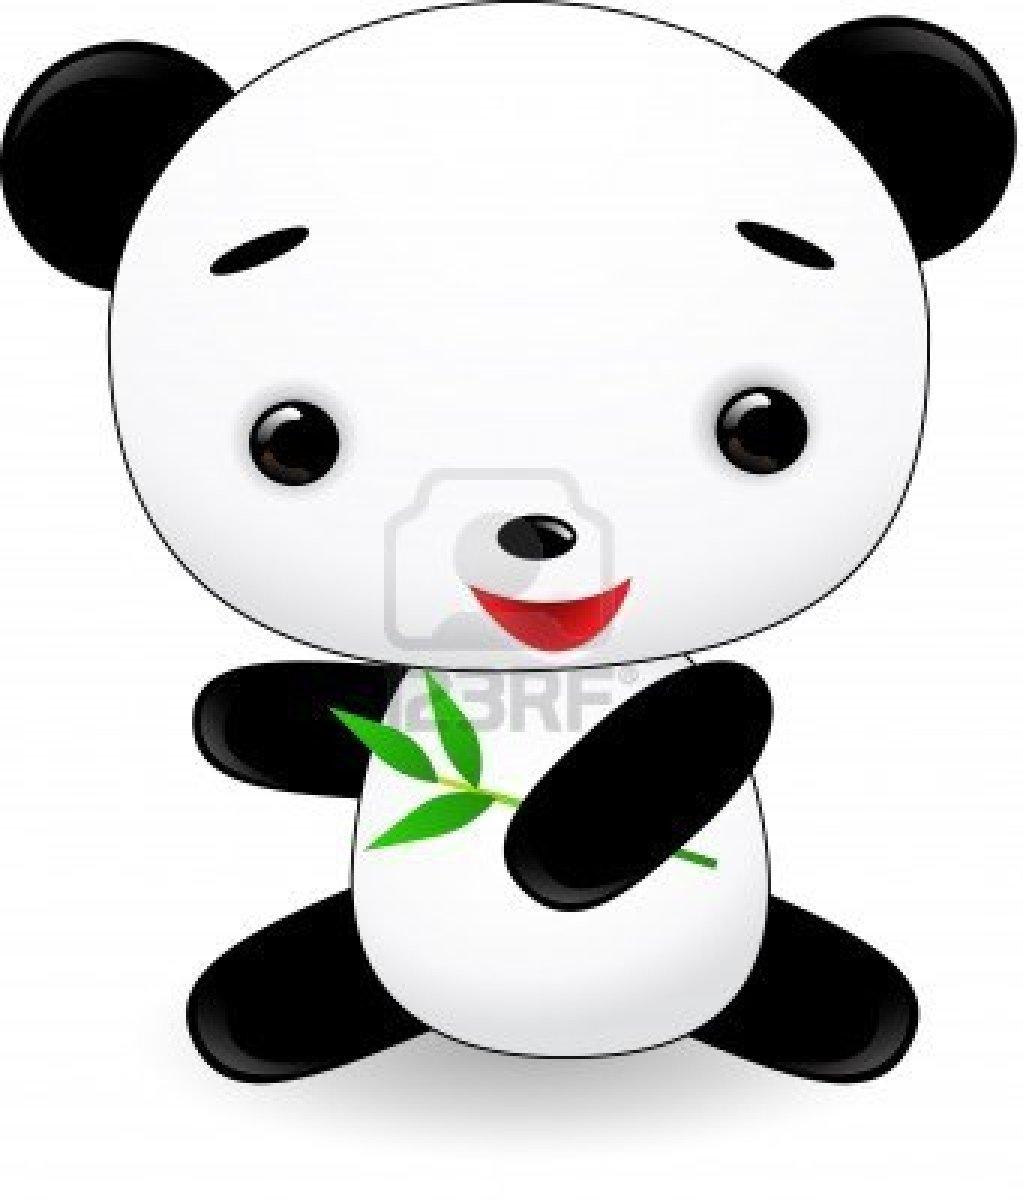 Dessins en couleurs imprimer panda num ro 108836 - Coloriage de panda kawaii ...